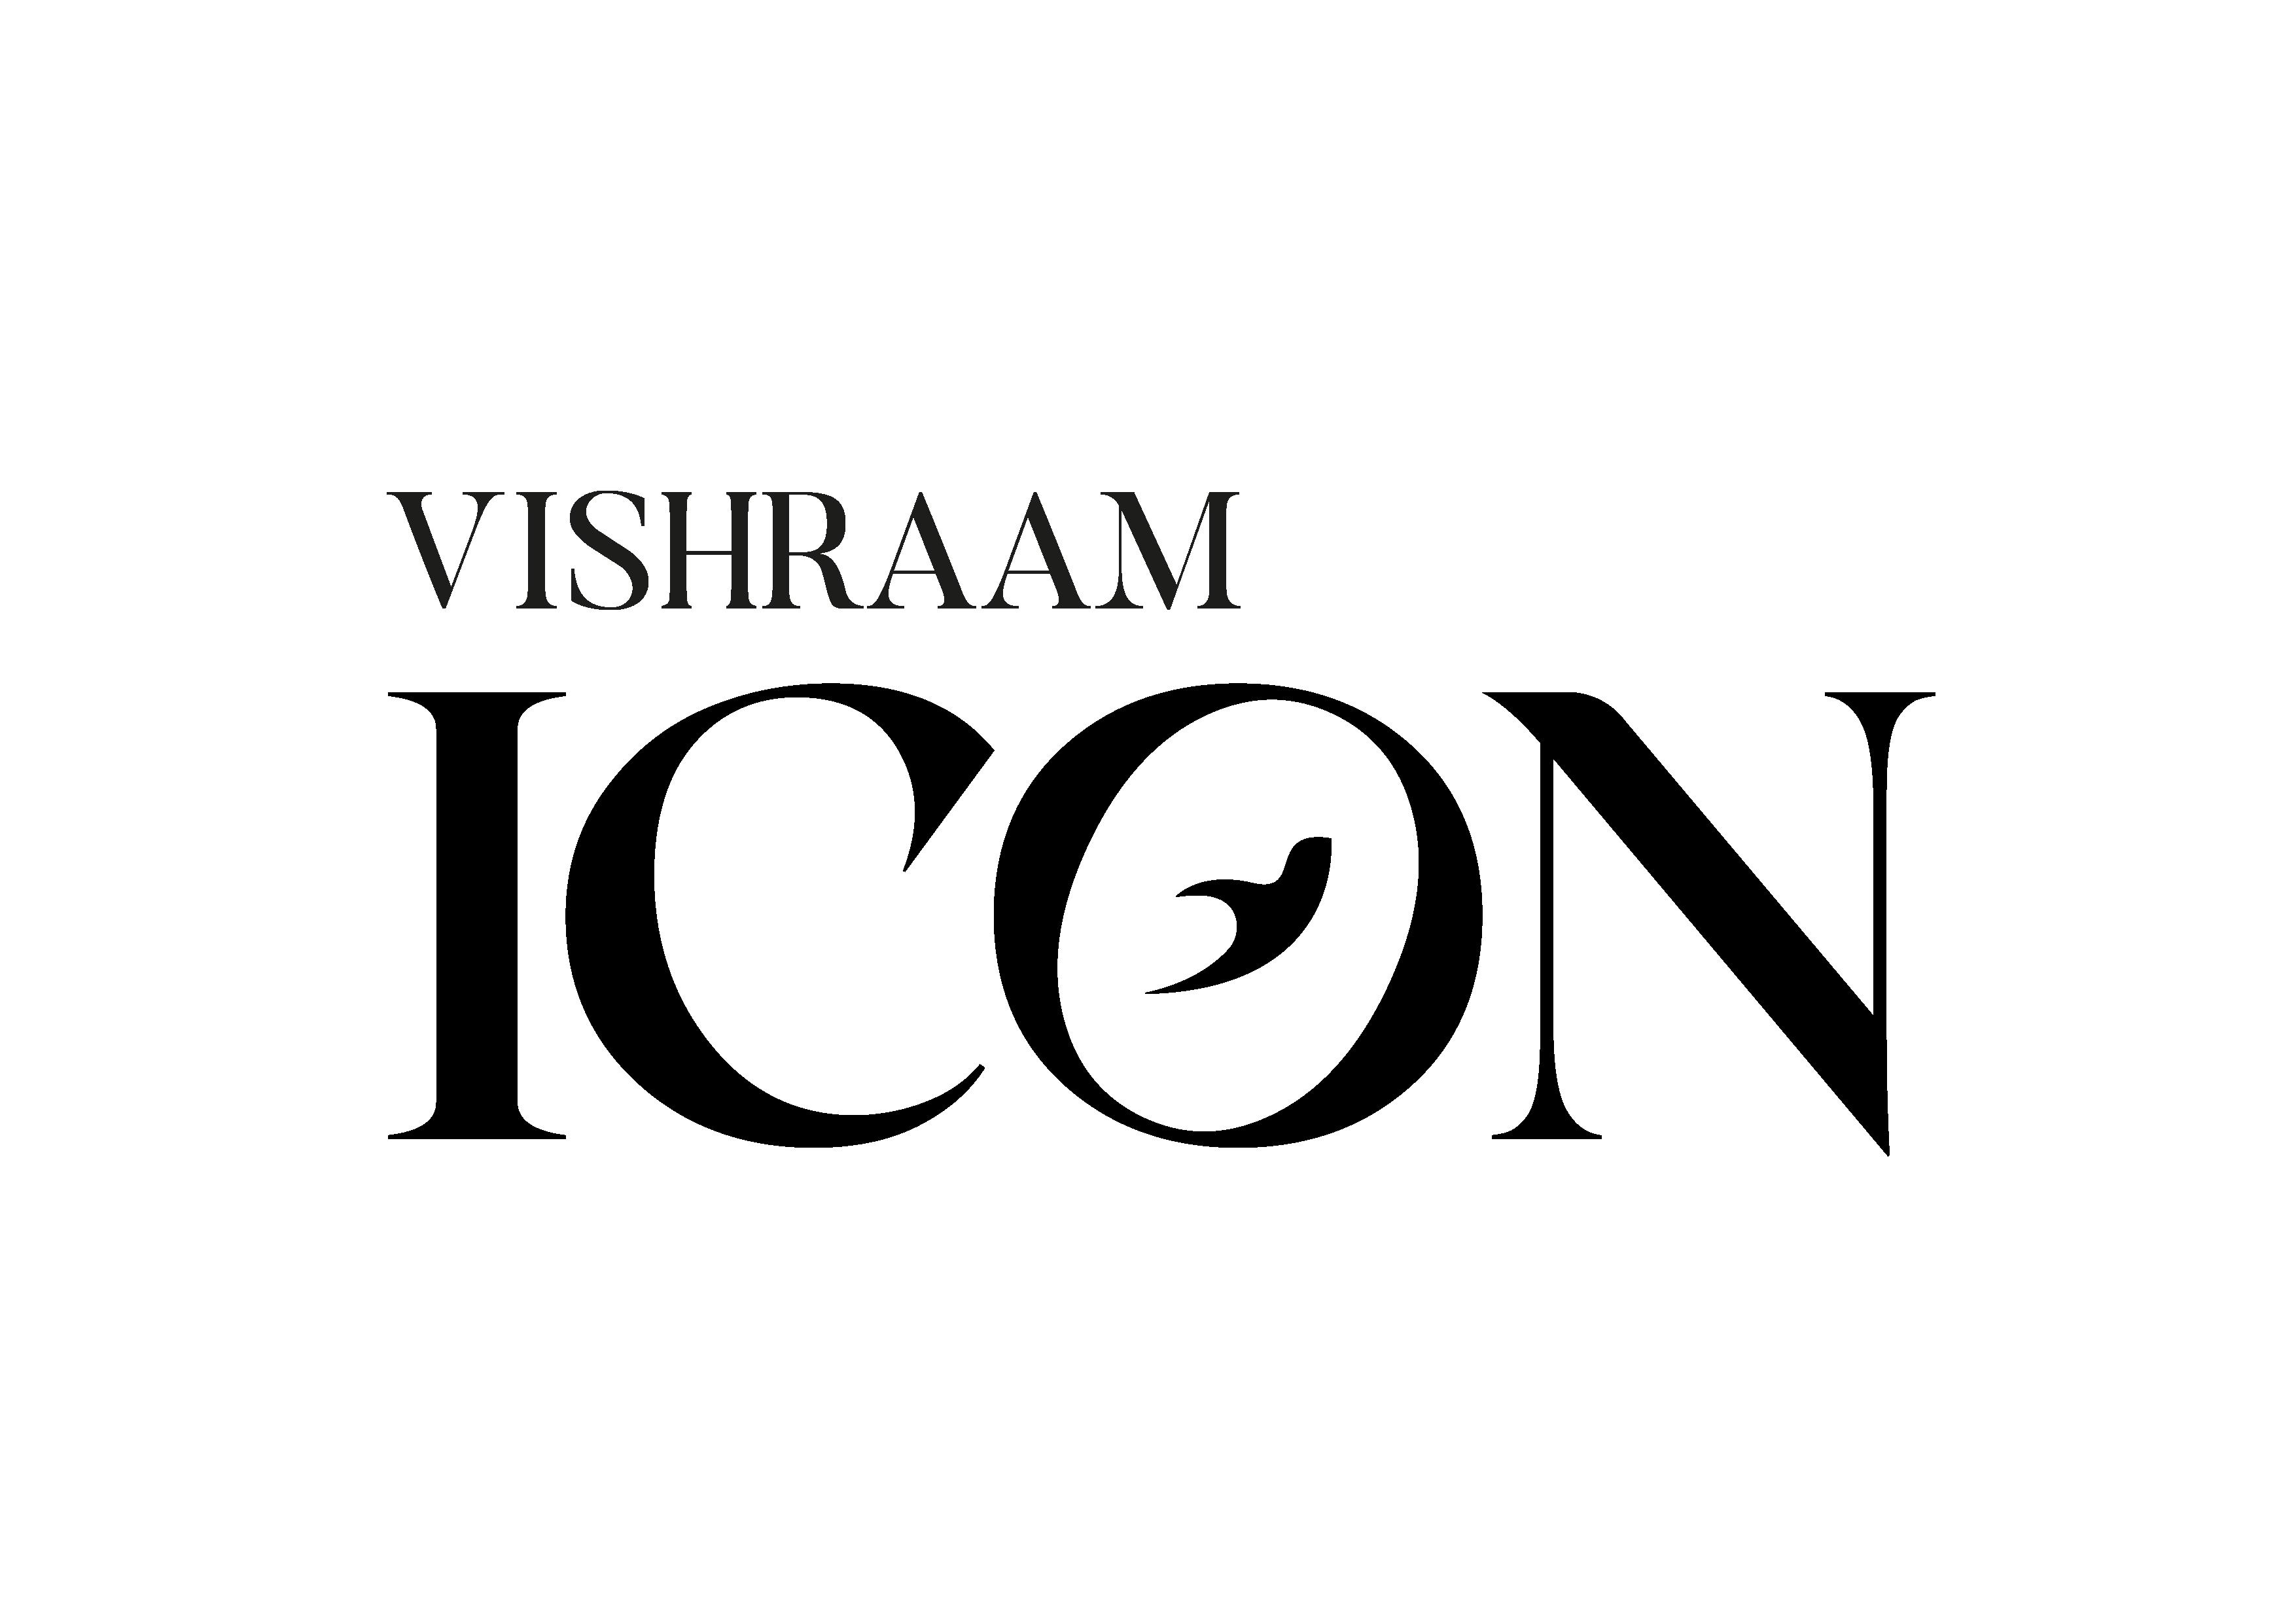 LOGO - Vishraam Icon